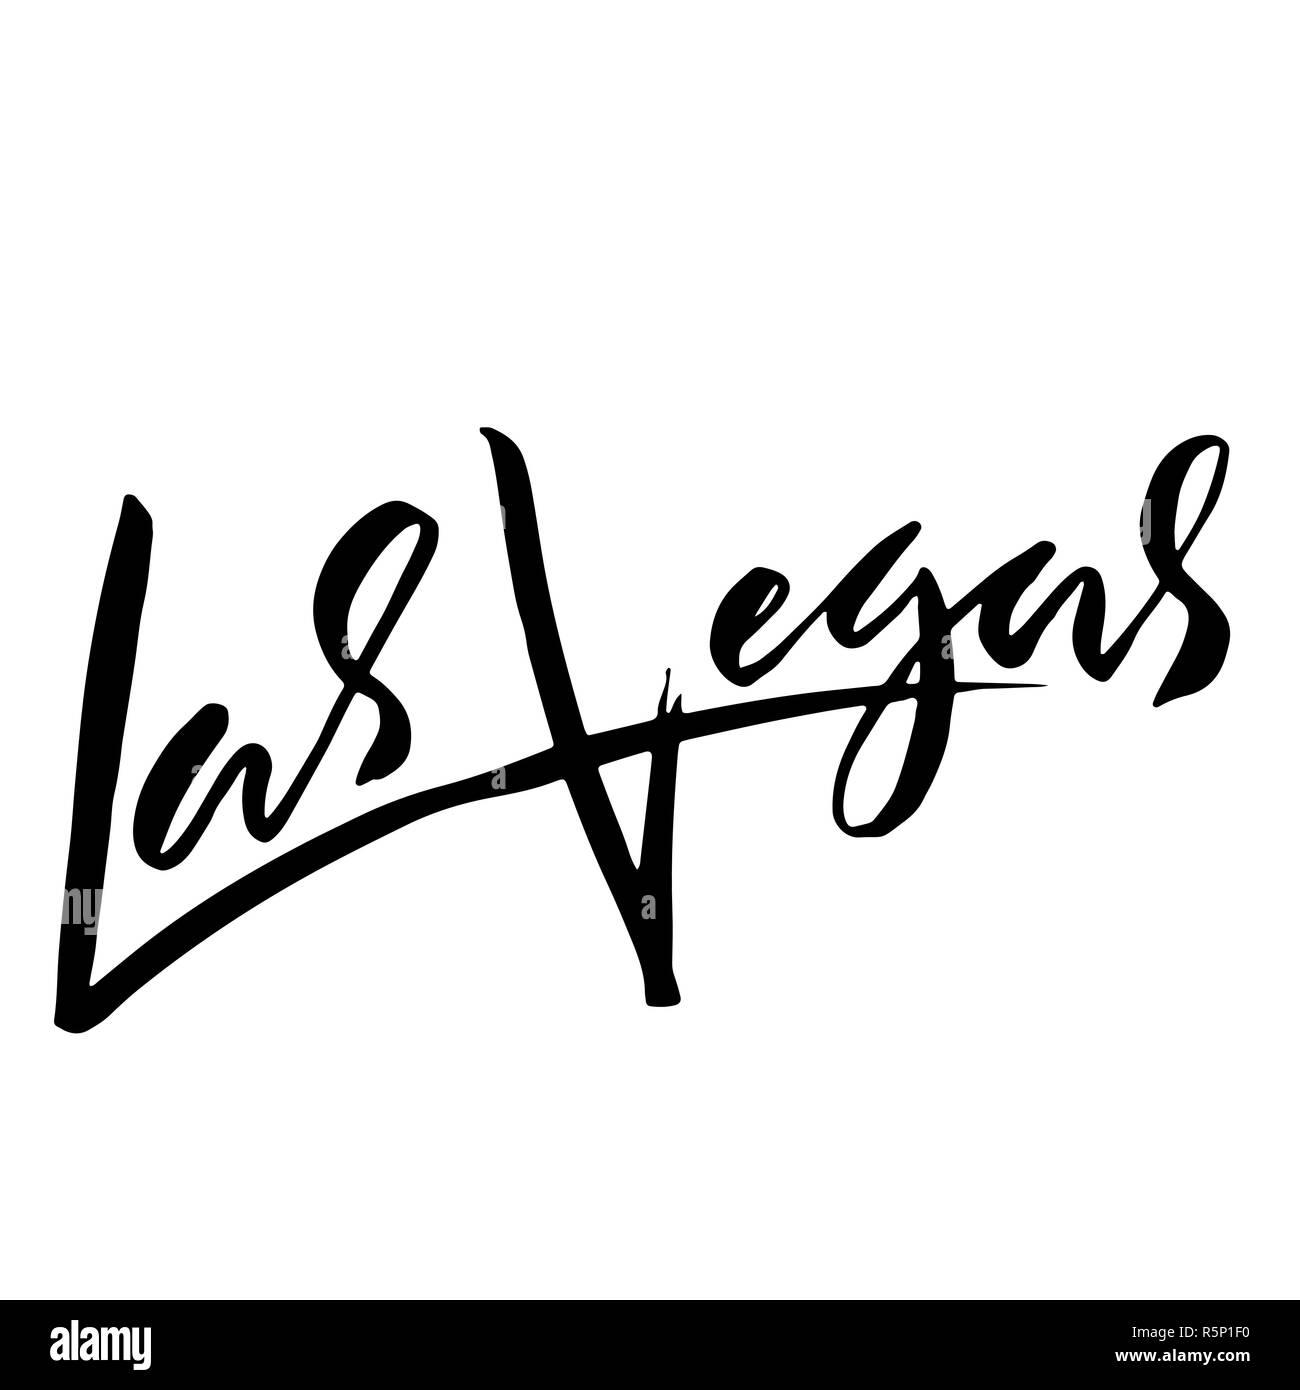 Las Vegas, USA  Typography dry brush lettering design  Hand drawn